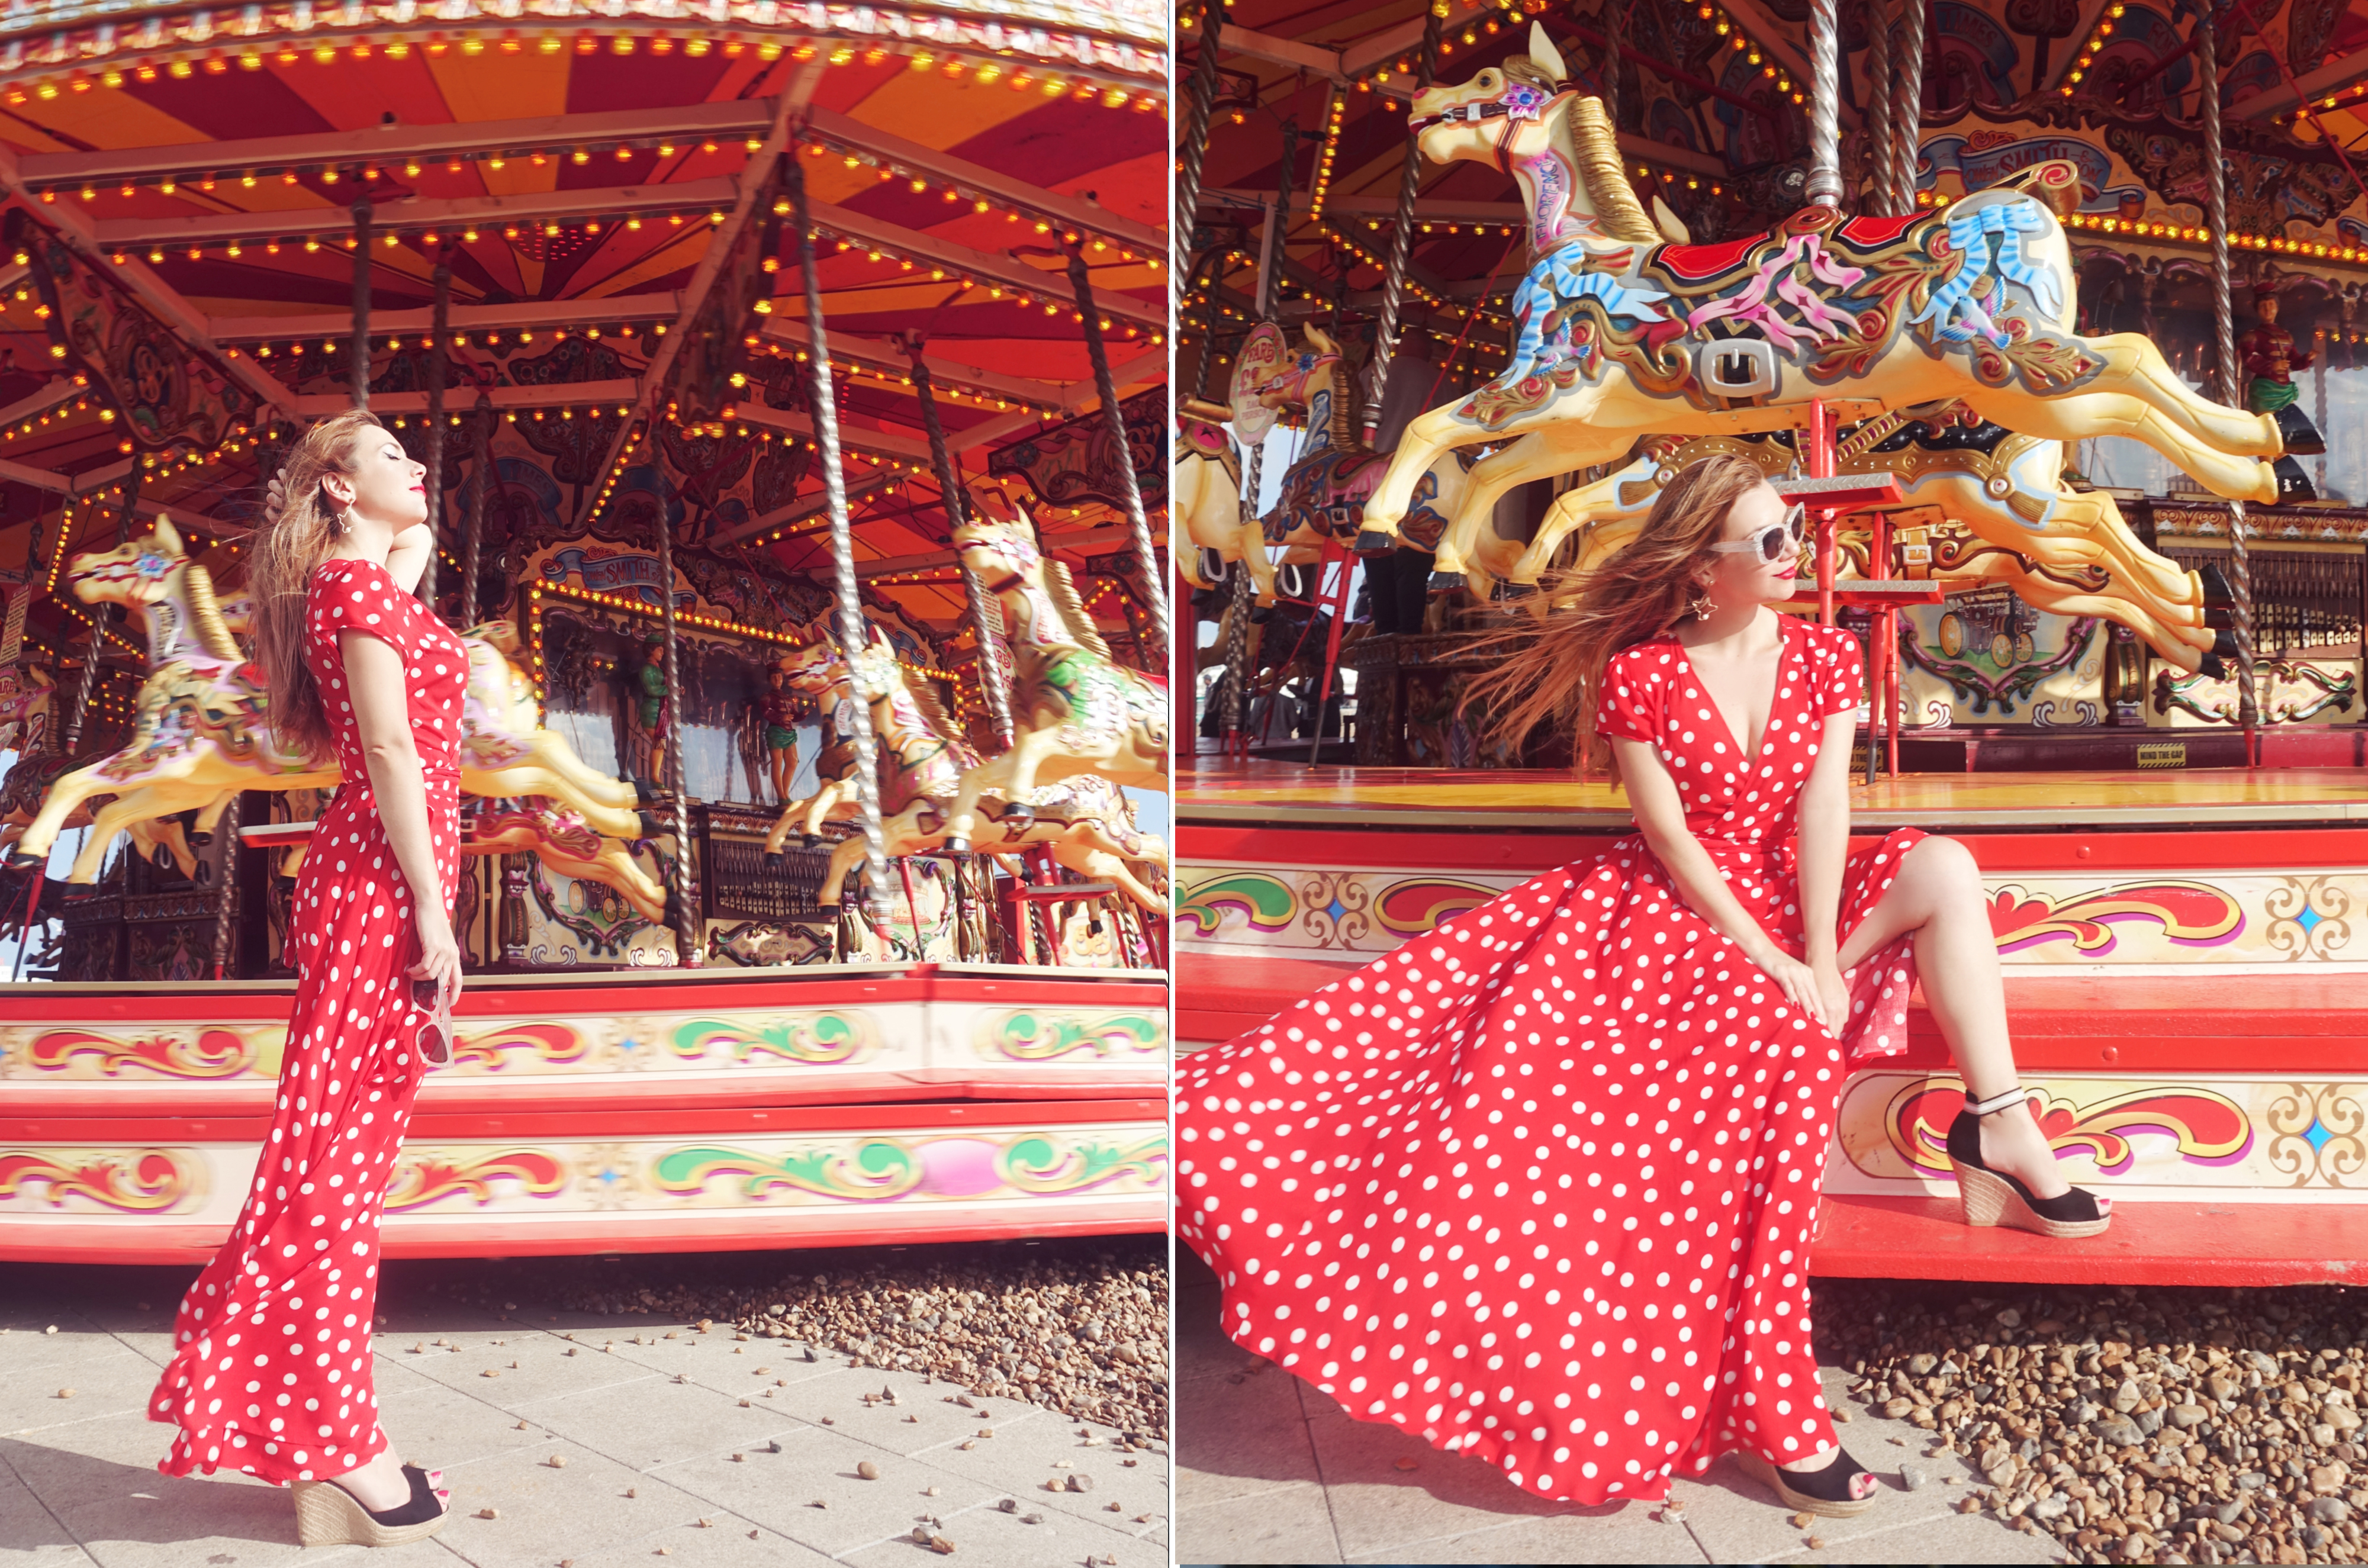 Carrousel-Brighton-blog-de-moda-Chicadicta-influencer-floryday-look-Piensa-en-Chic-polkadot-Chicadicta-Piensaenchic-fashion-travel